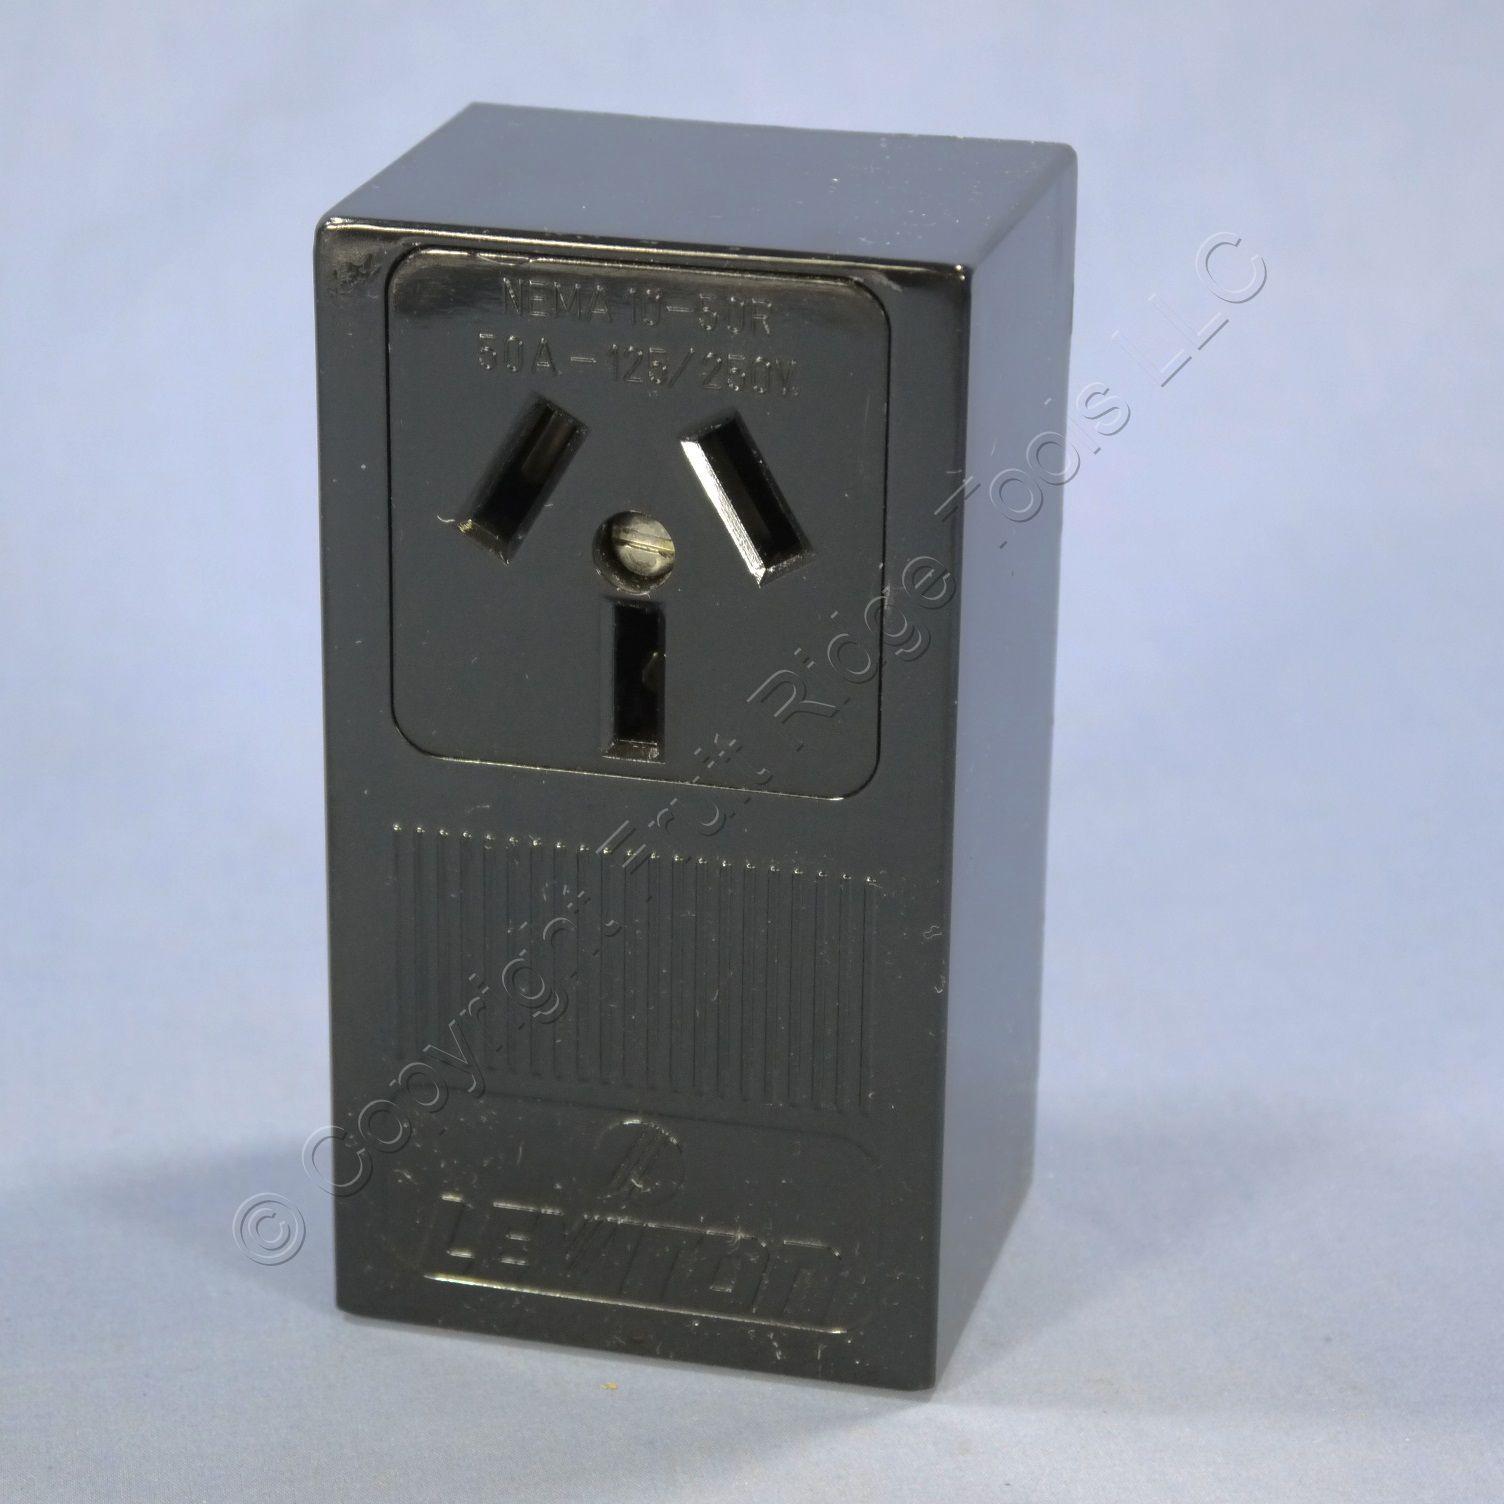 L5050 EA 4 leviton range dryer 10 50 surface mount receptacle outlet nema 10 leviton 30a 125 250v plug wiring diagram at readyjetset.co